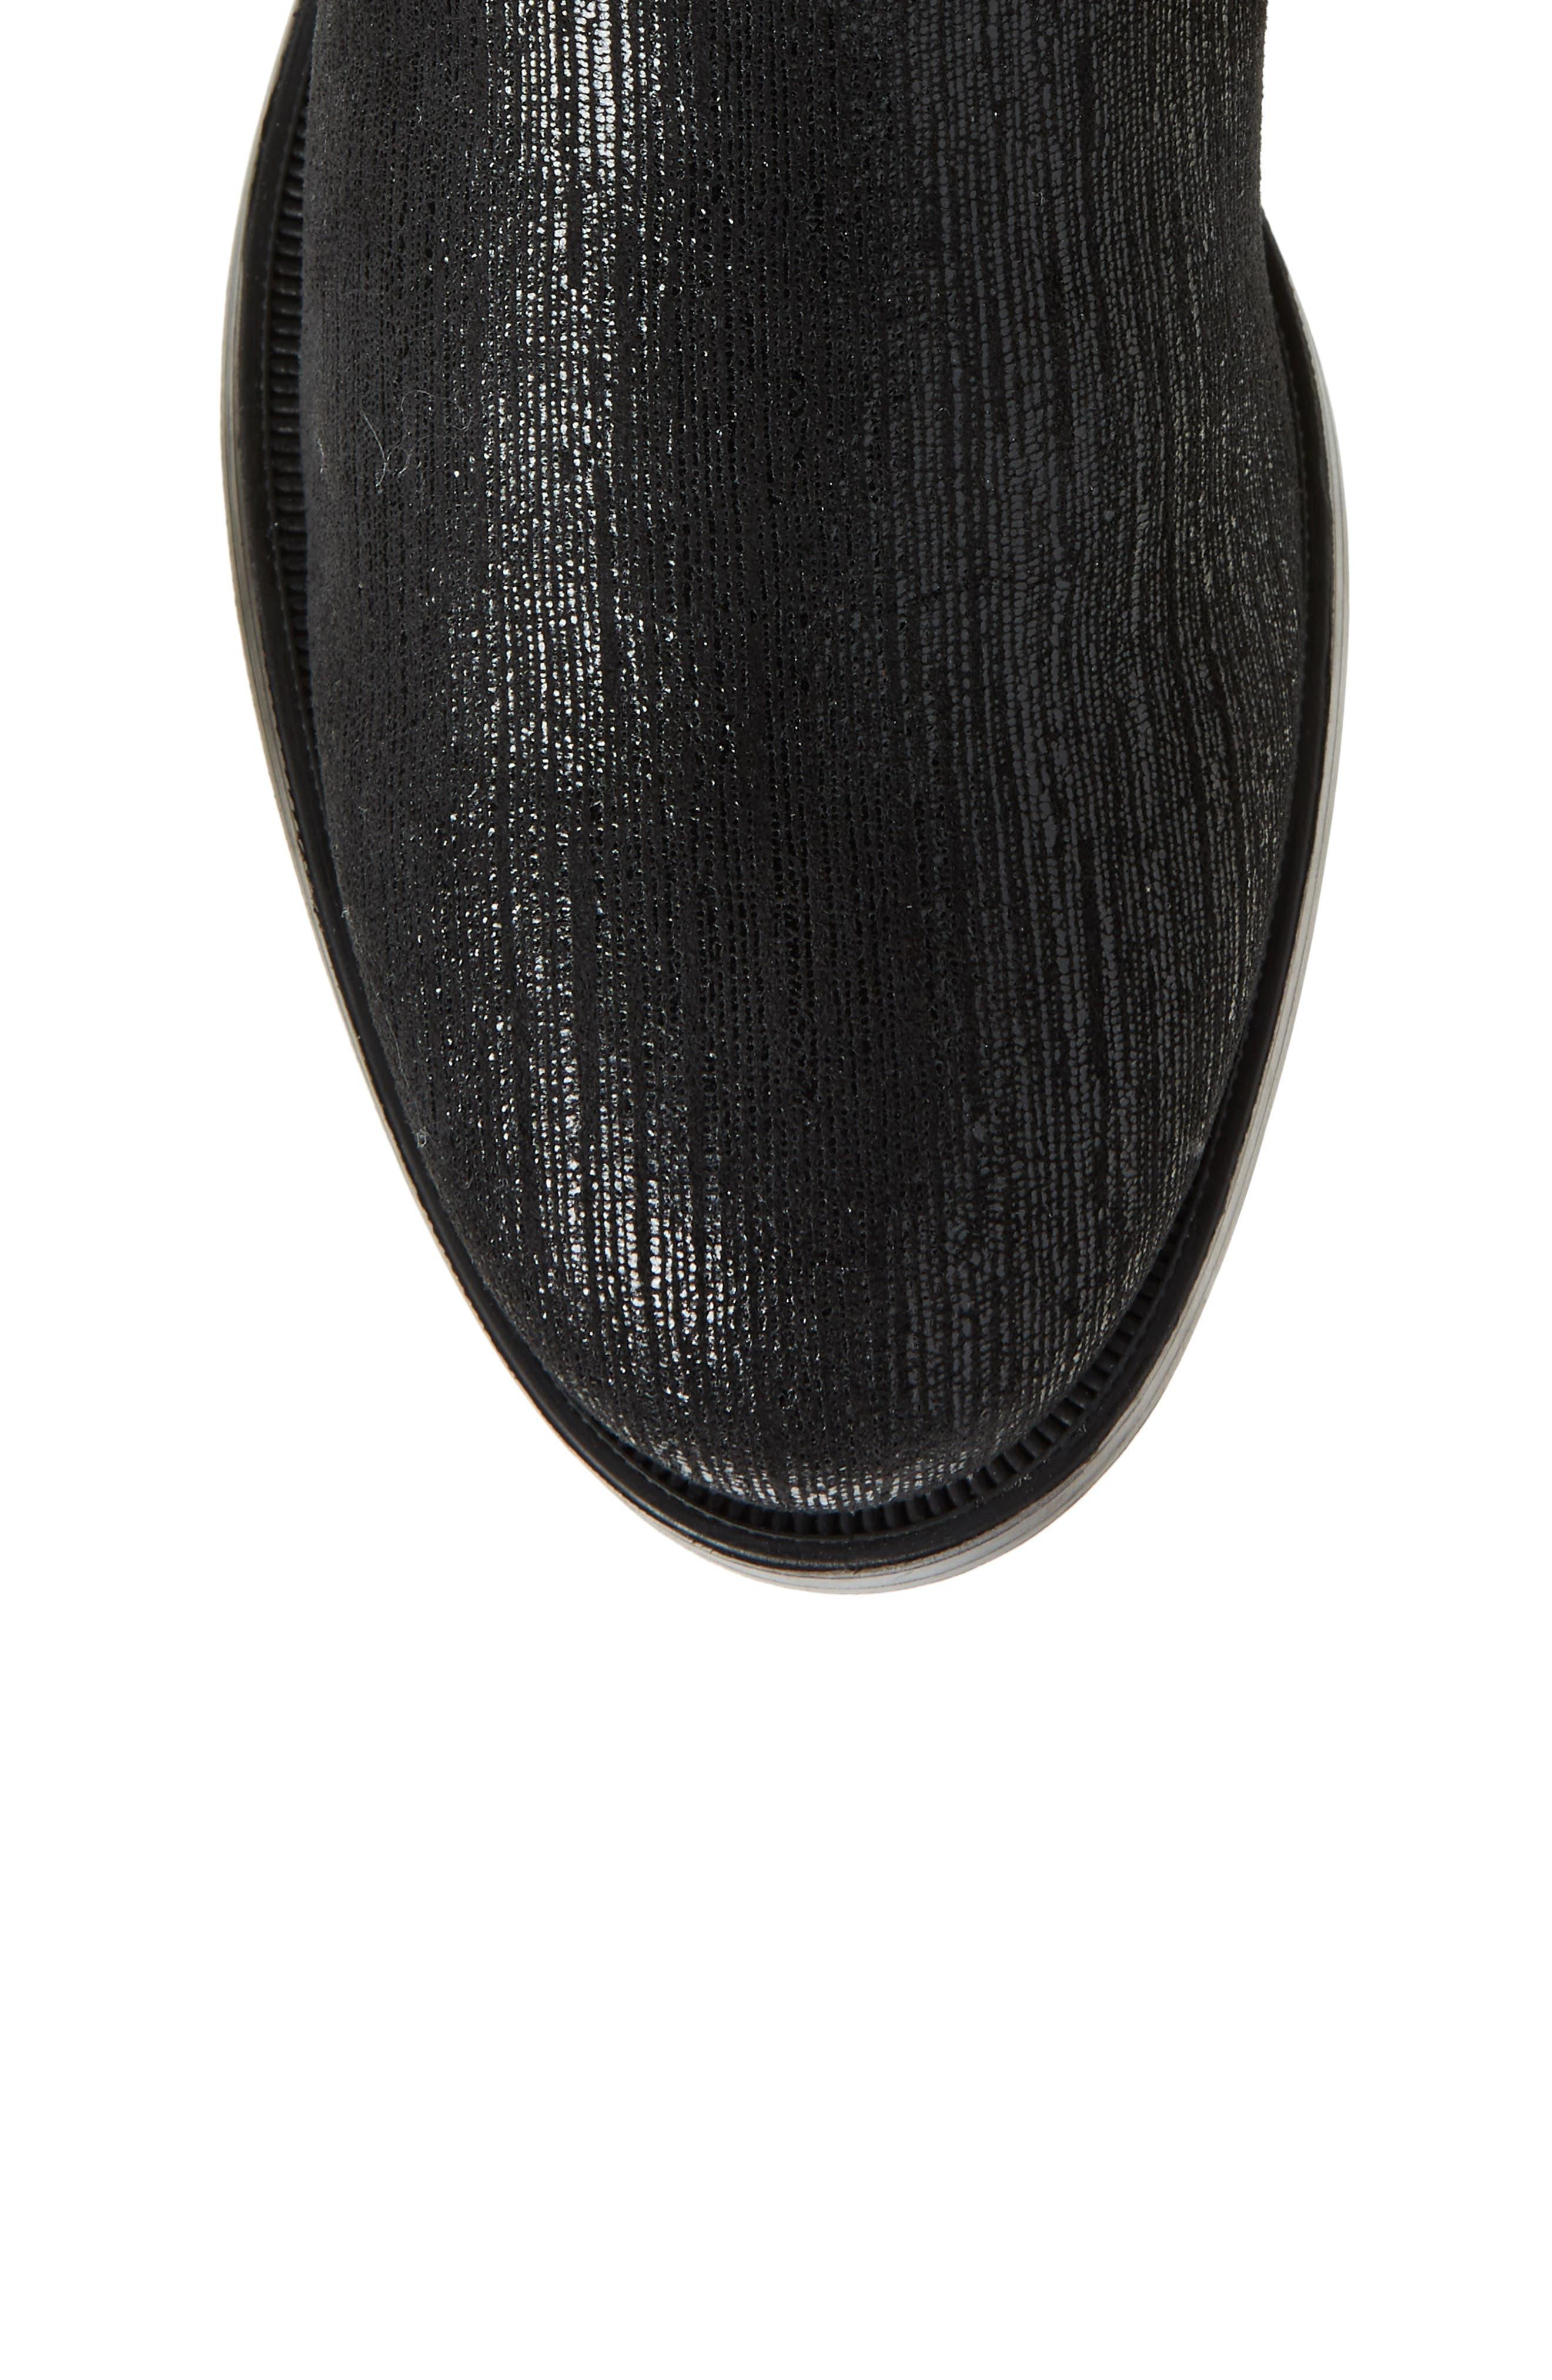 Bunt Waterproof Over the Knee Boot,                             Alternate thumbnail 5, color,                             Black Metal/ Lycra